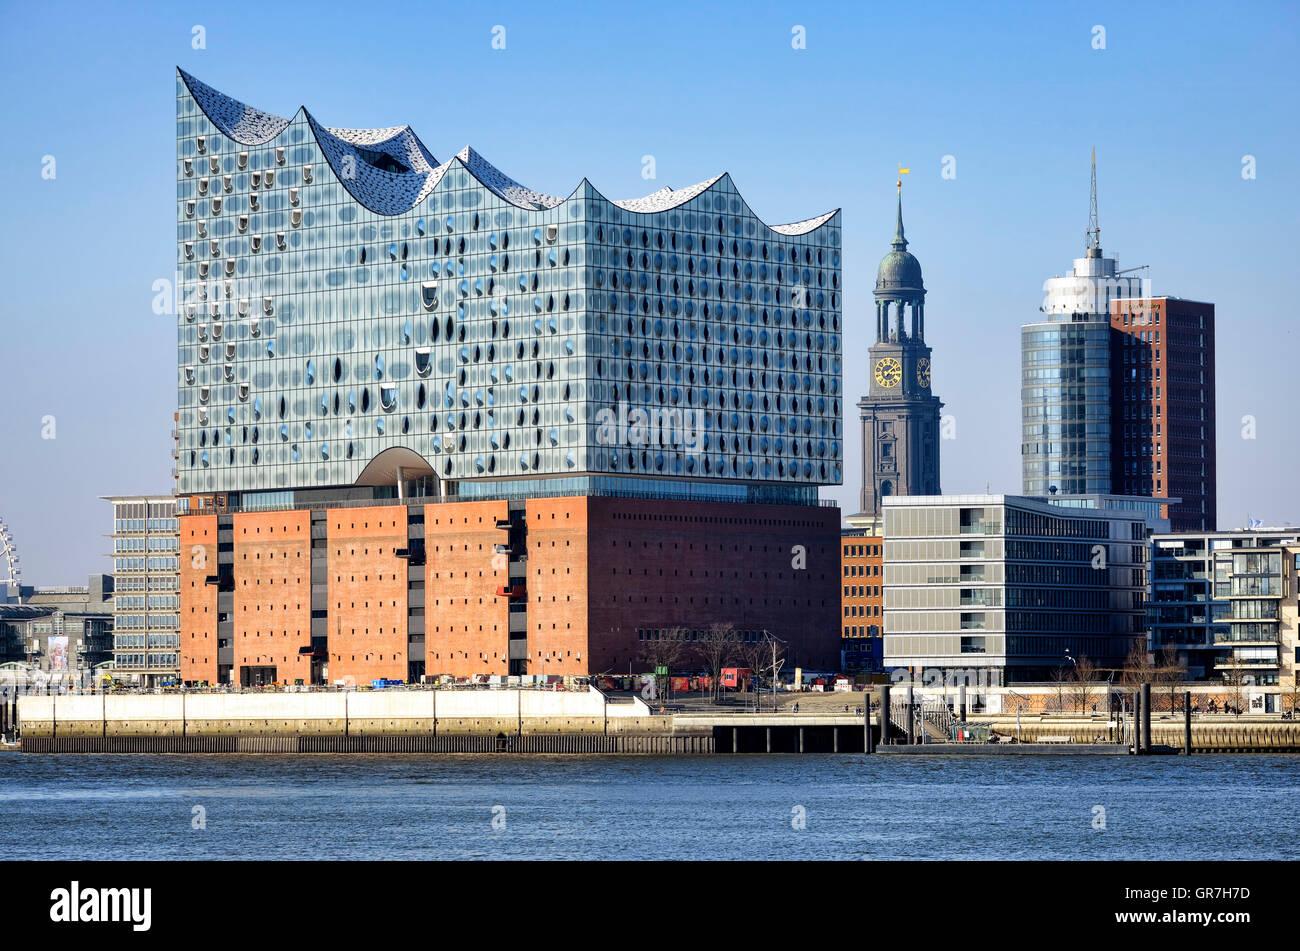 Elbe Philharmonic Hall In Hamburg, Germany - Stock Image